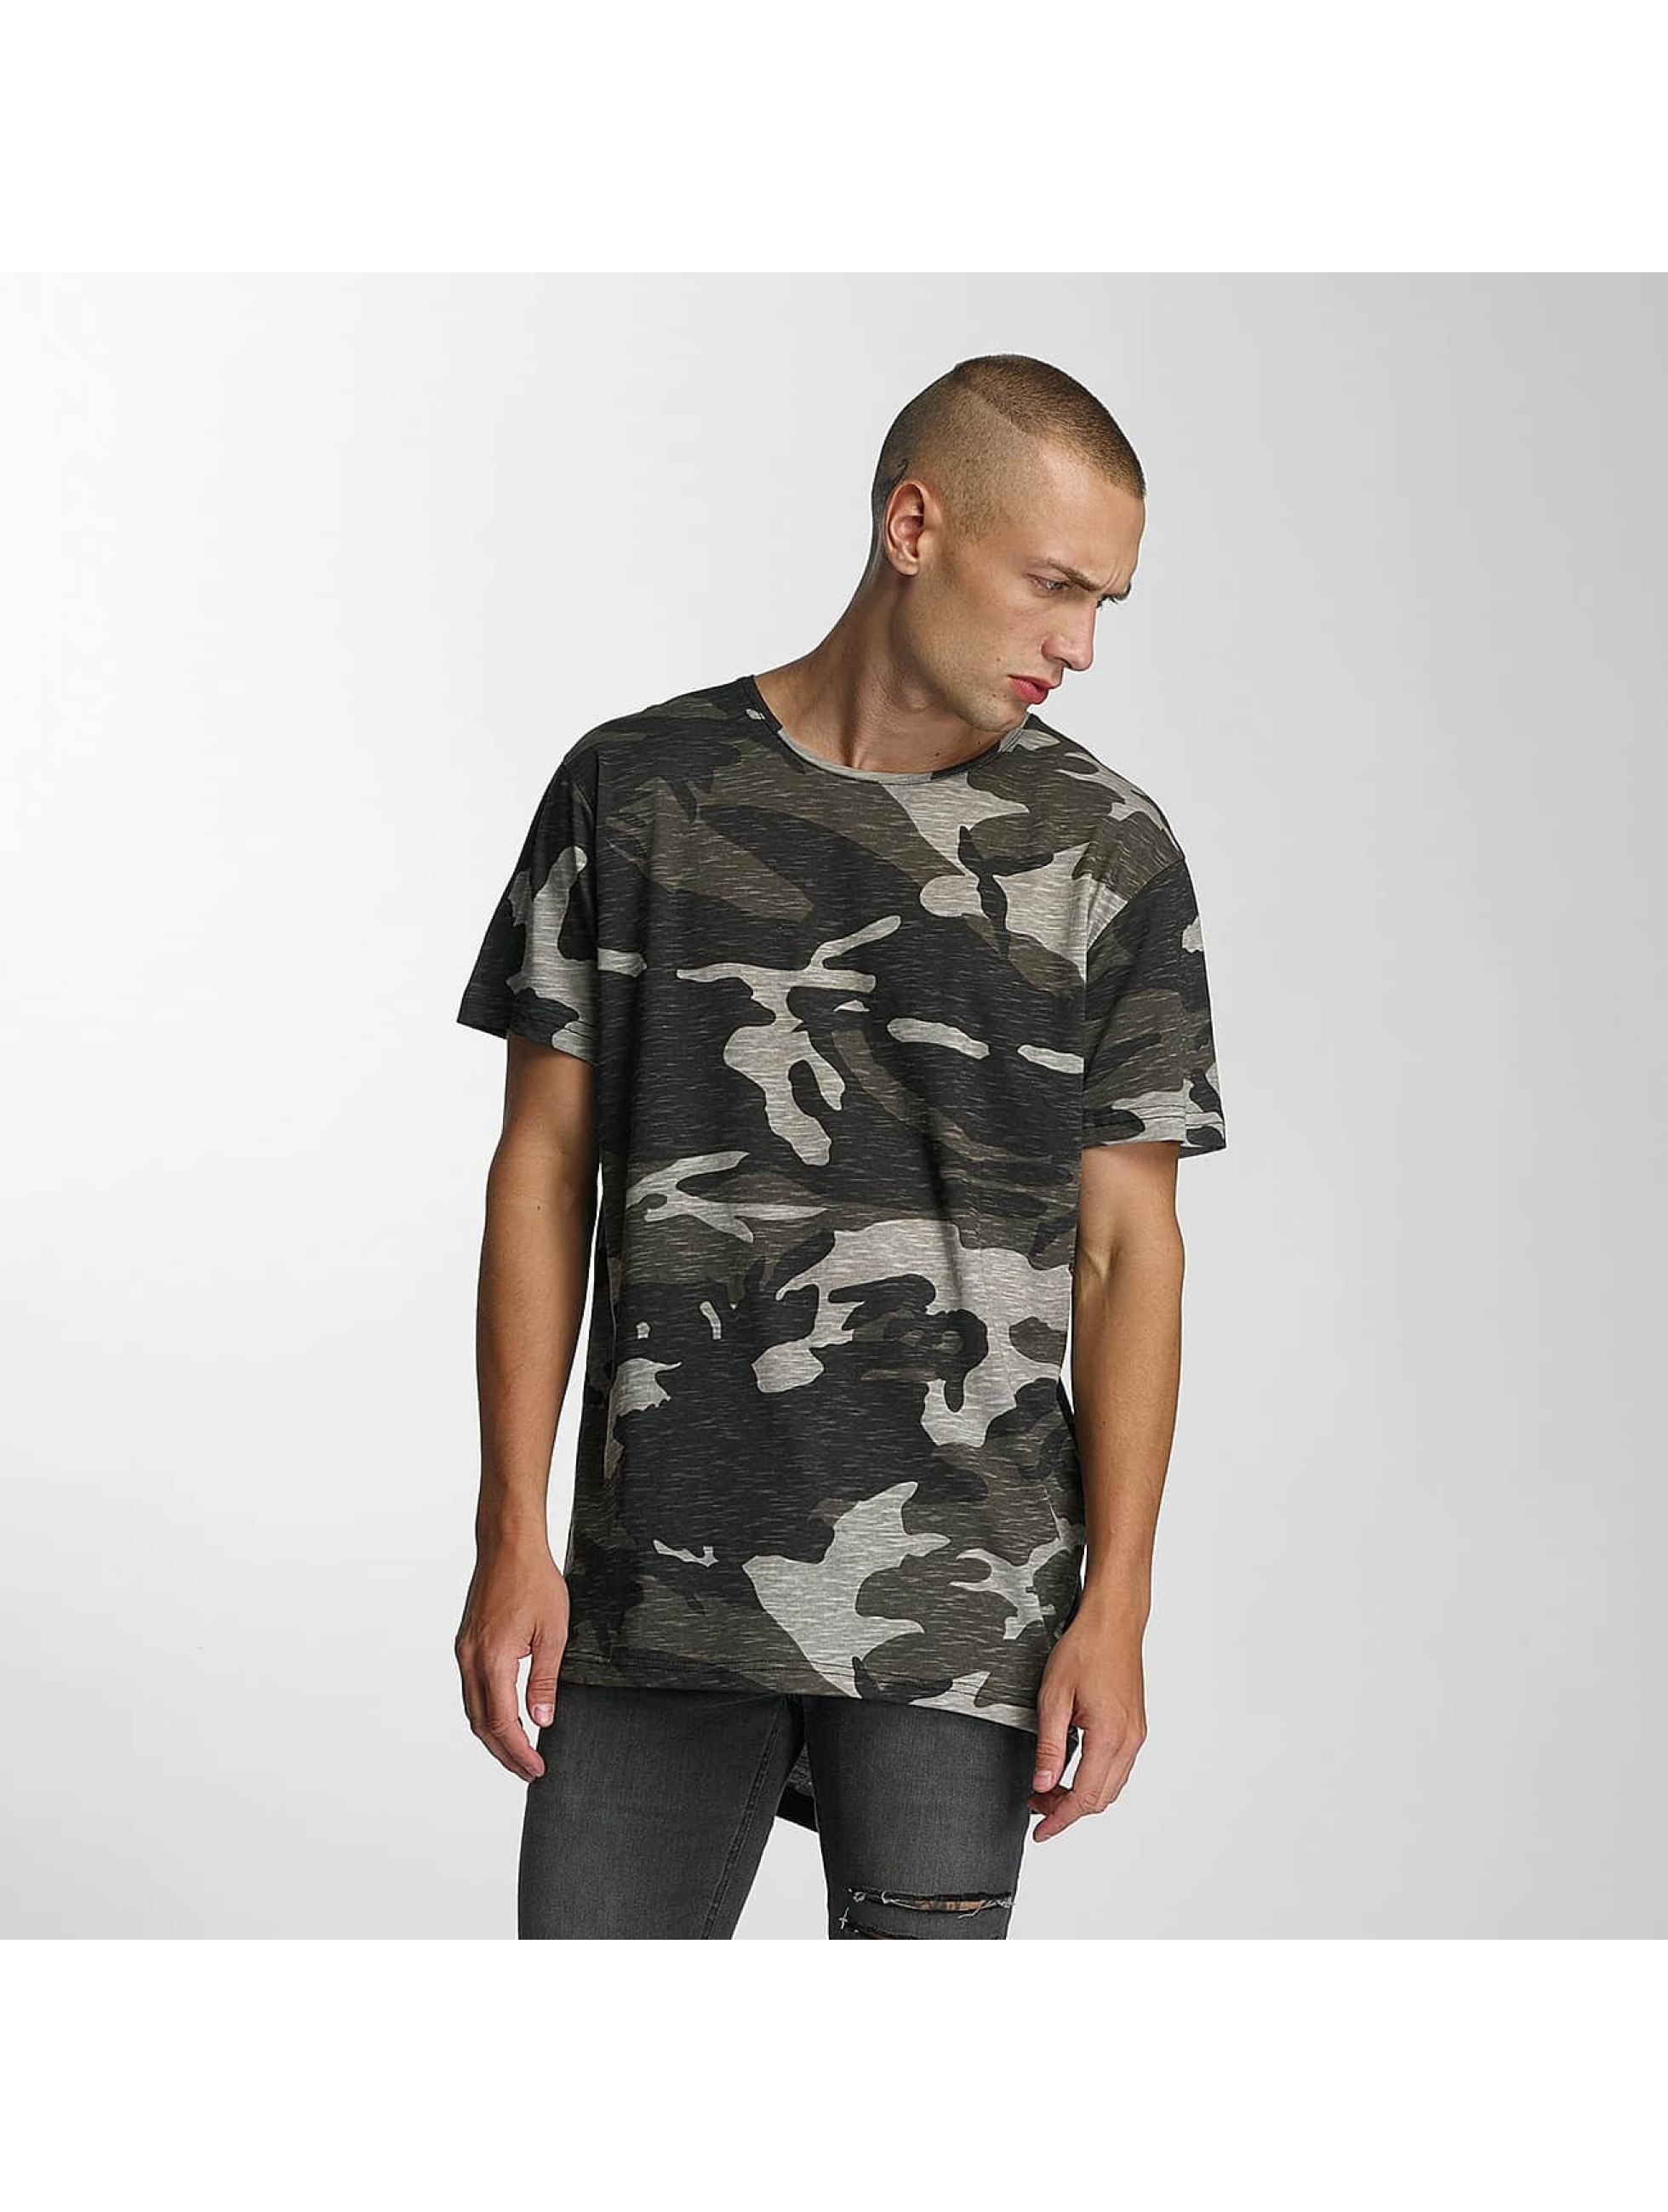 Griesen Angebote Bangastic Männer T-Shirt Fiano in camouflage